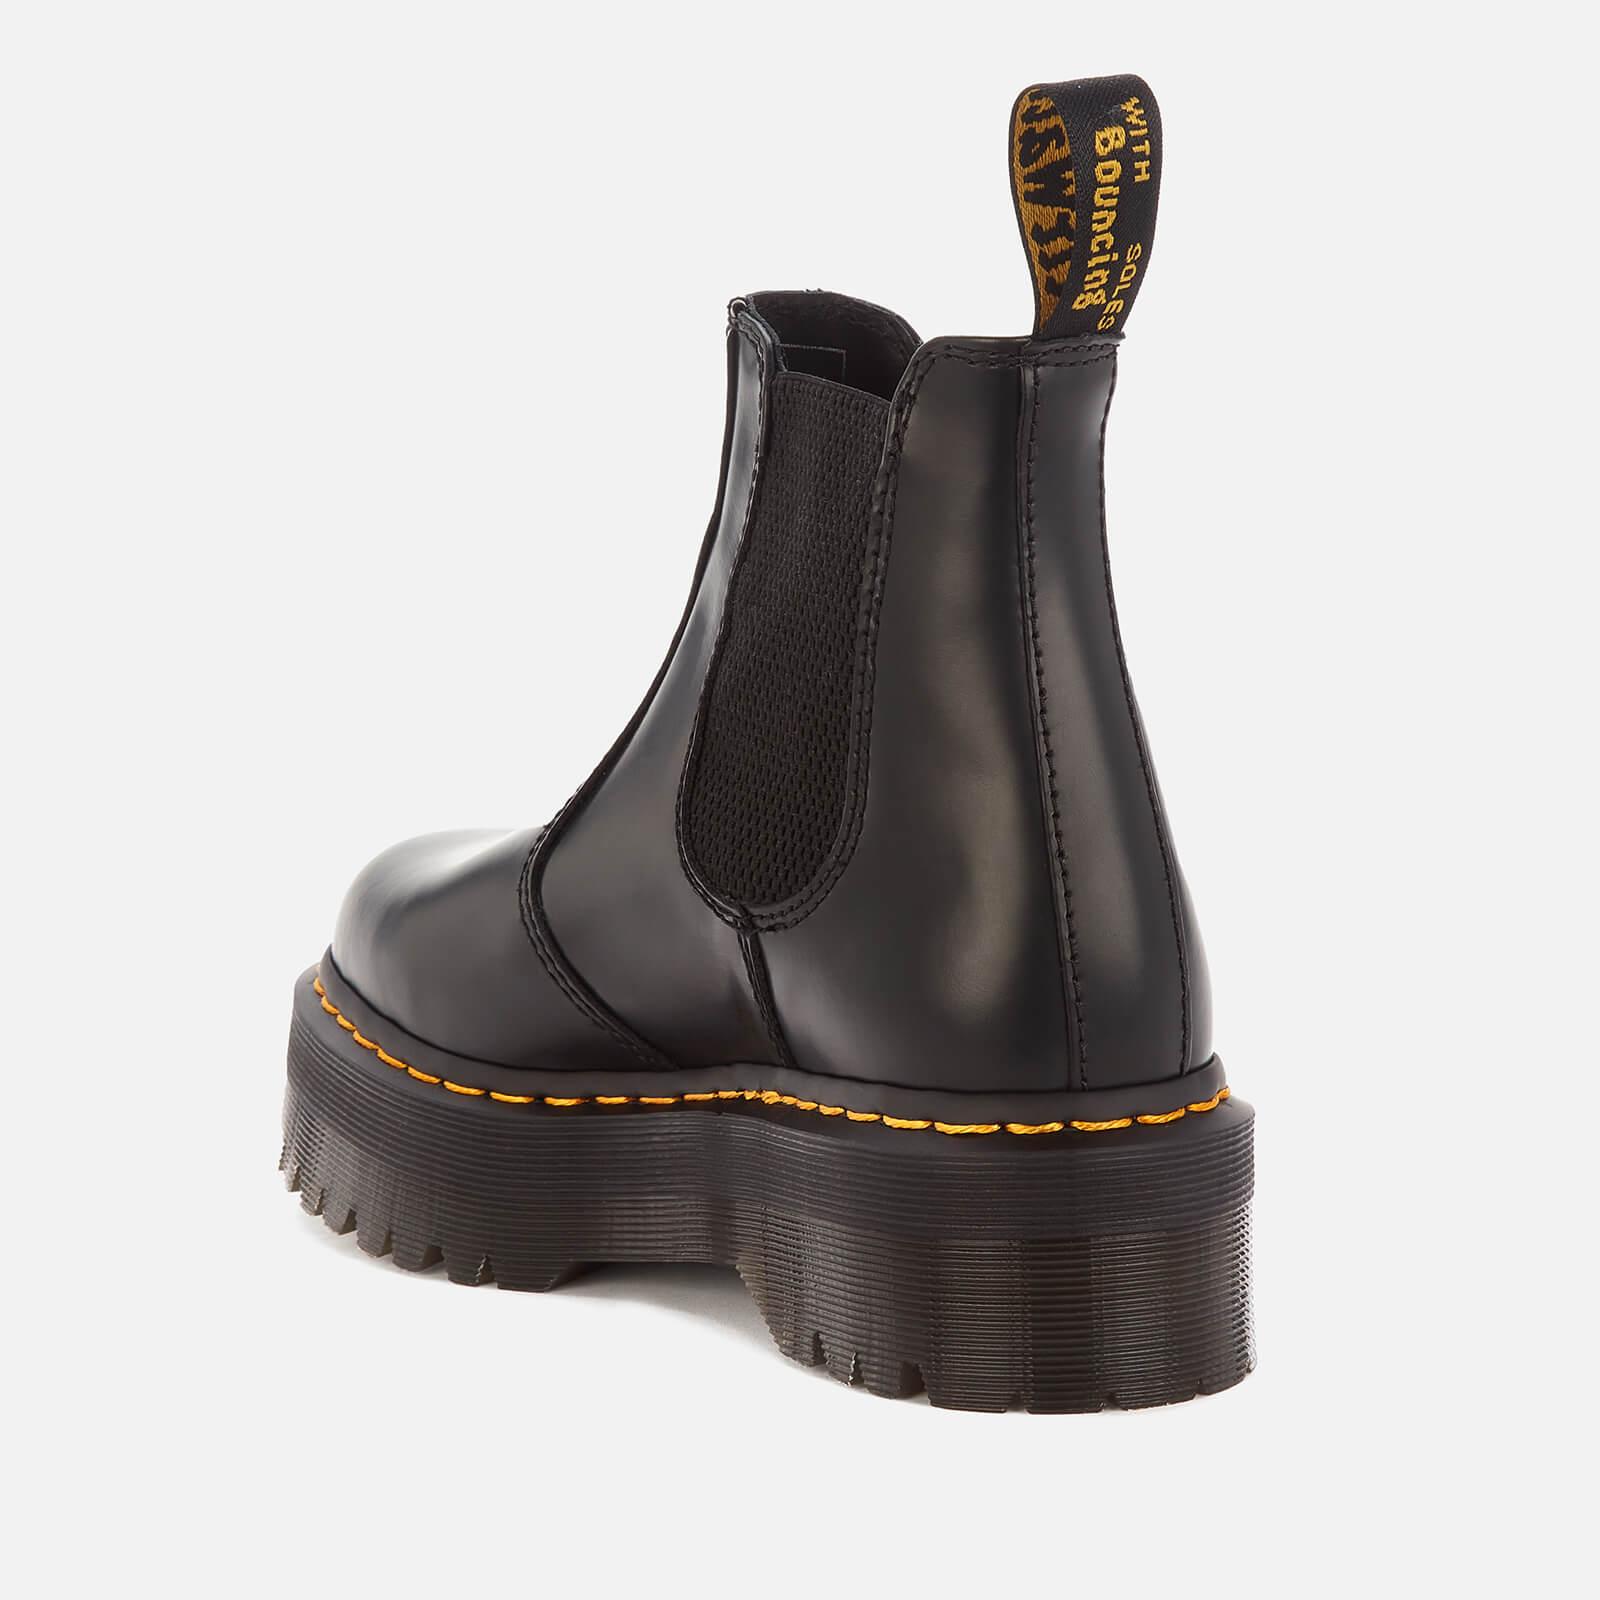 Dr. Martens 2976 Quad Polished Smooth Leather Chelsea Boots - Black - Uk 9